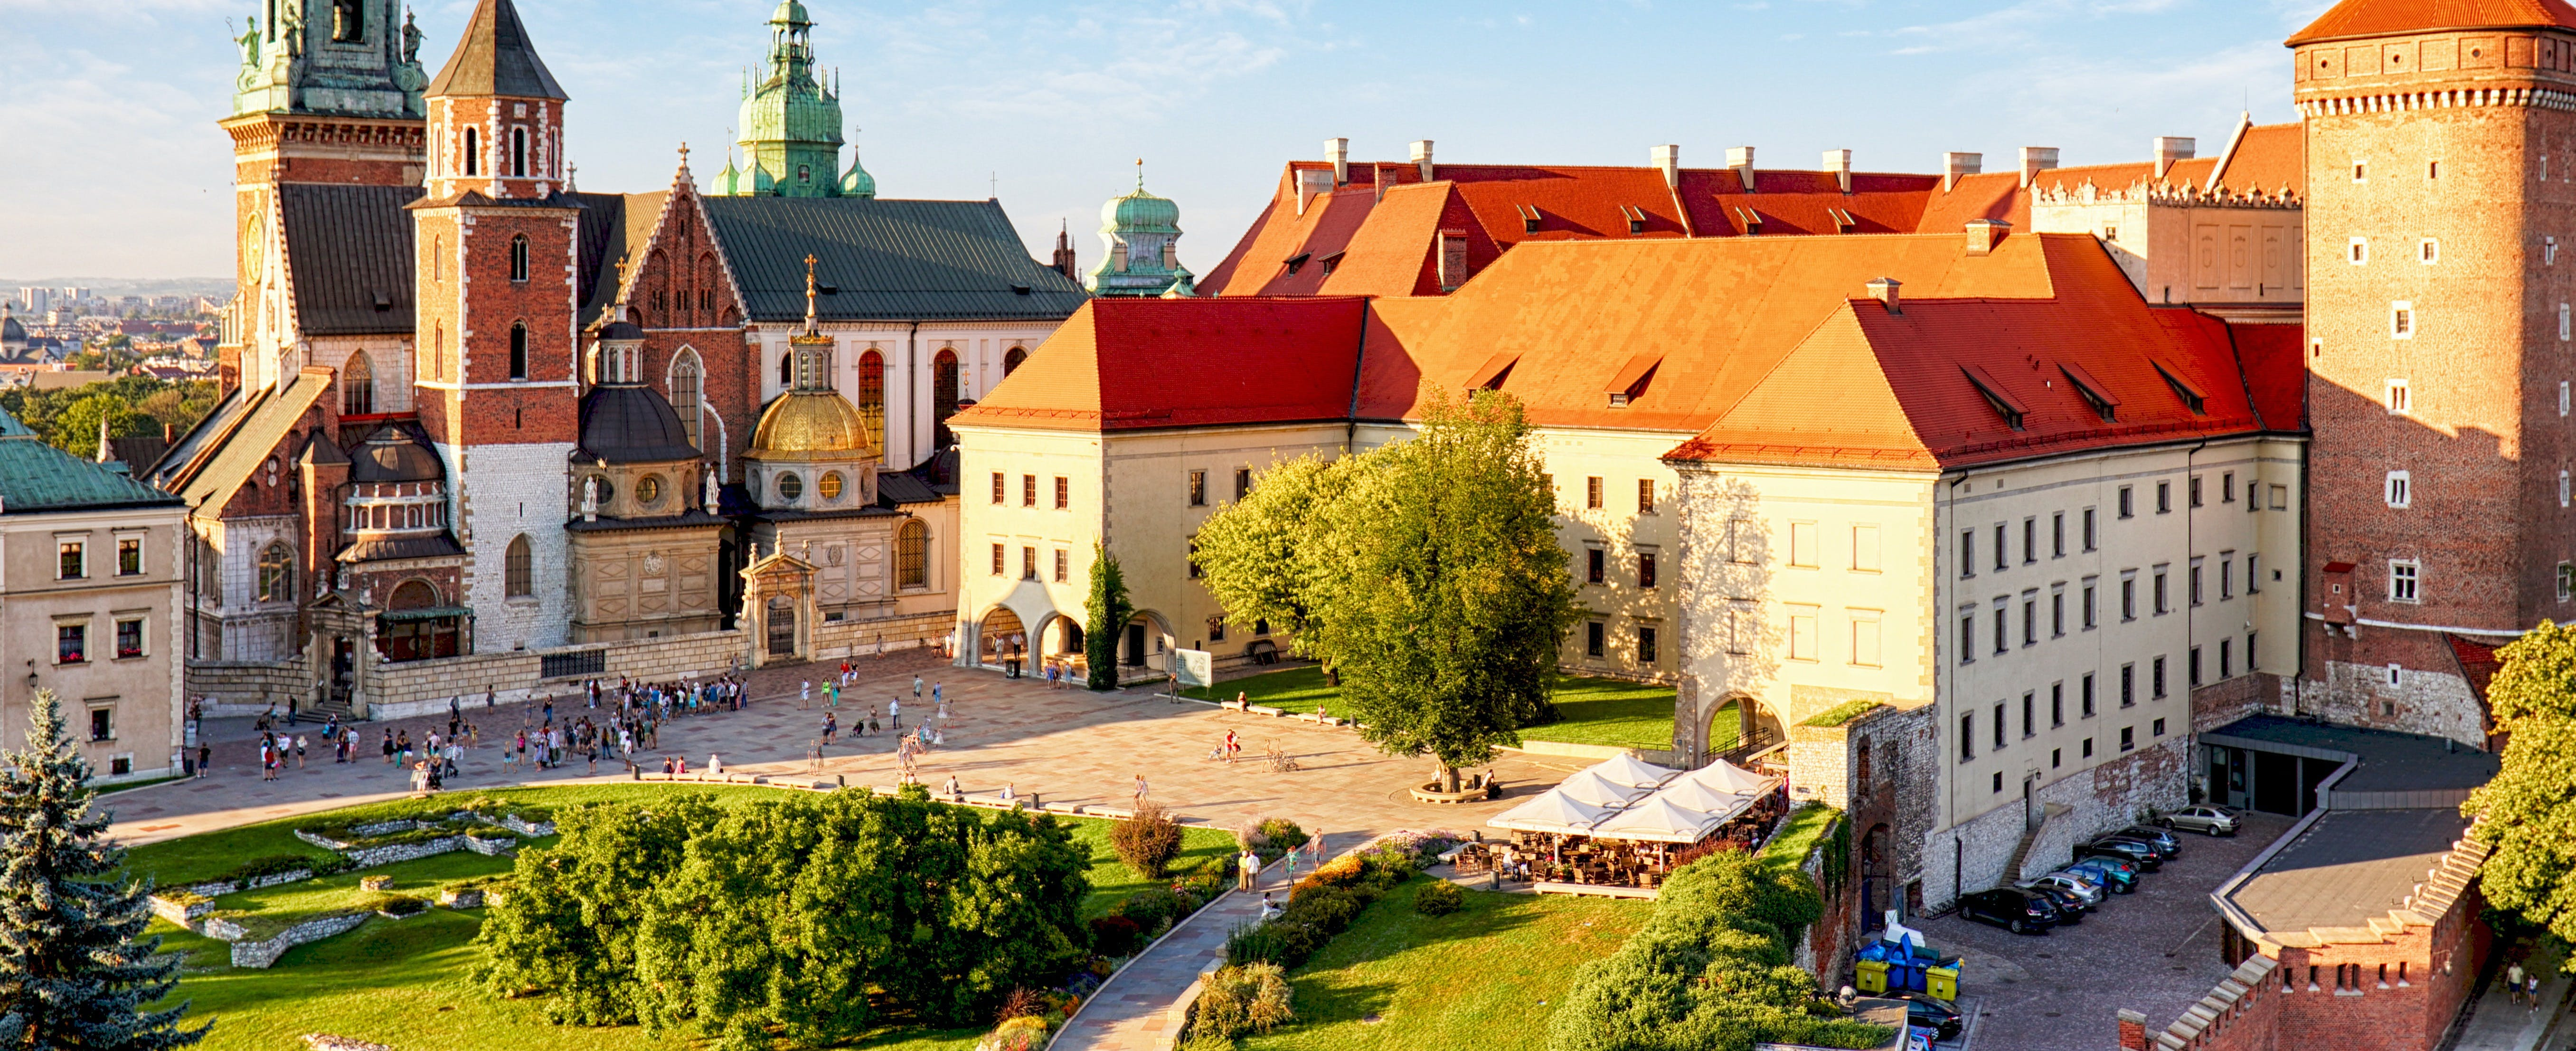 Wawel Castle Tickets and Tours in Krakow | musement